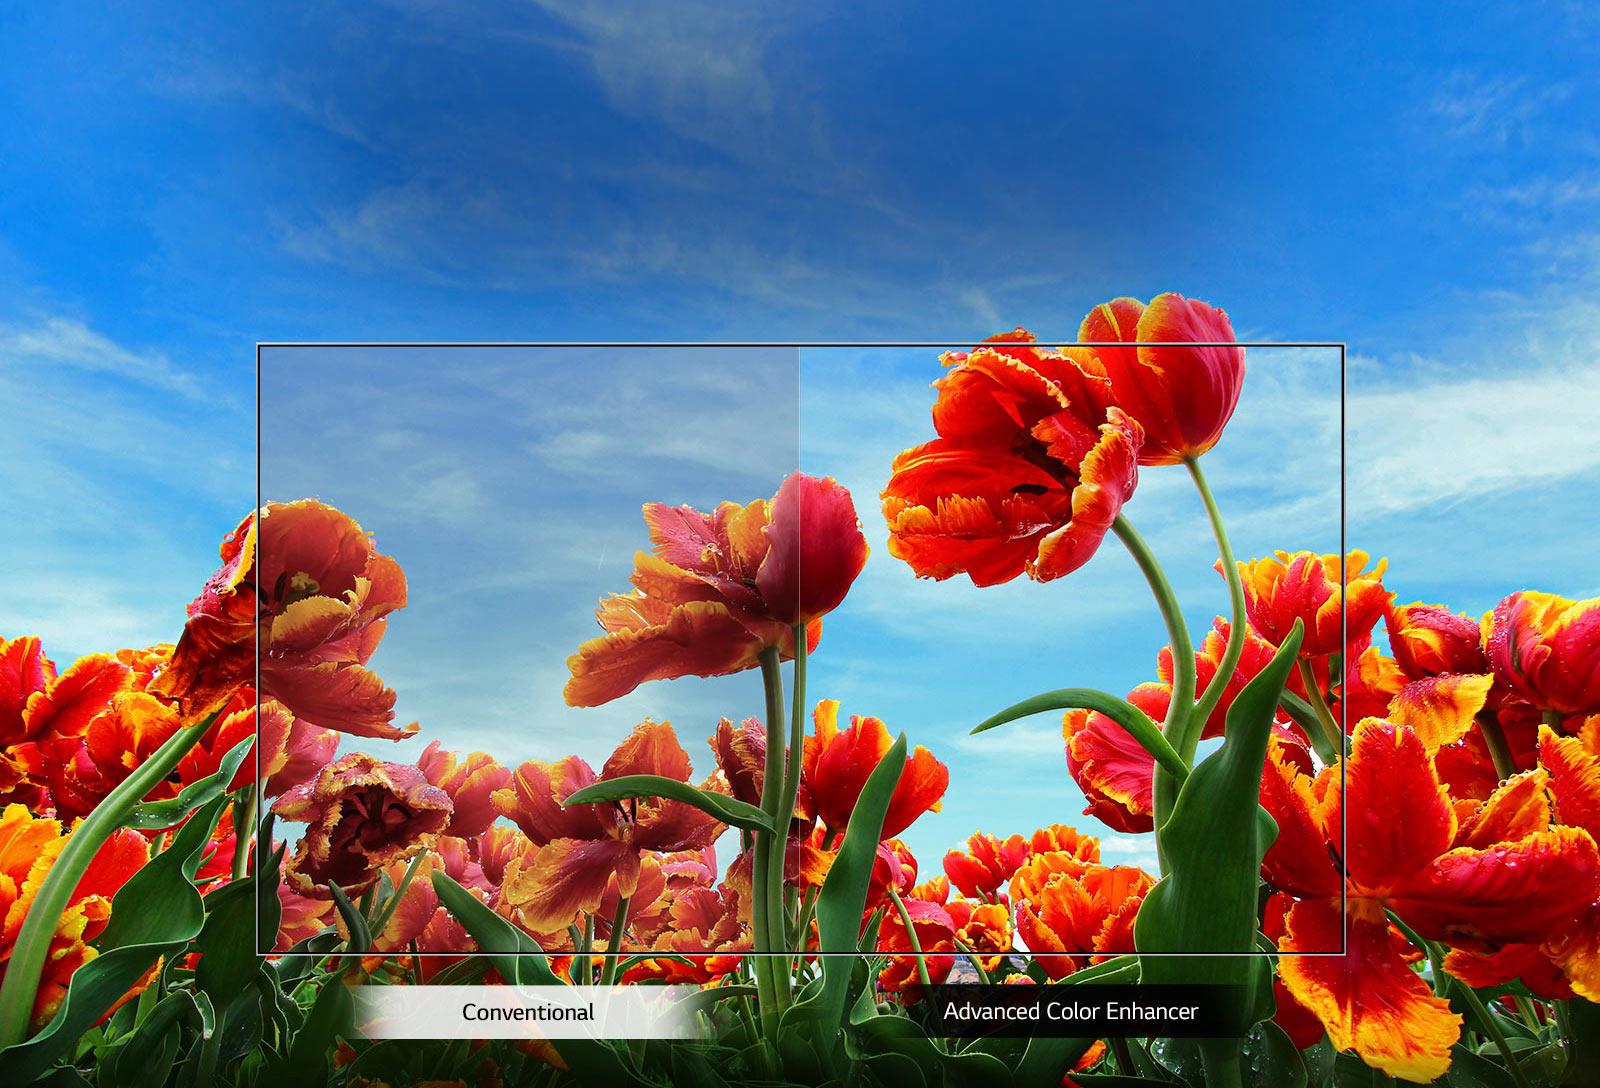 تلویزیون ال جی 43 اینچ مدل LM6300_ تلویزیون هوشمند 43 اینچ